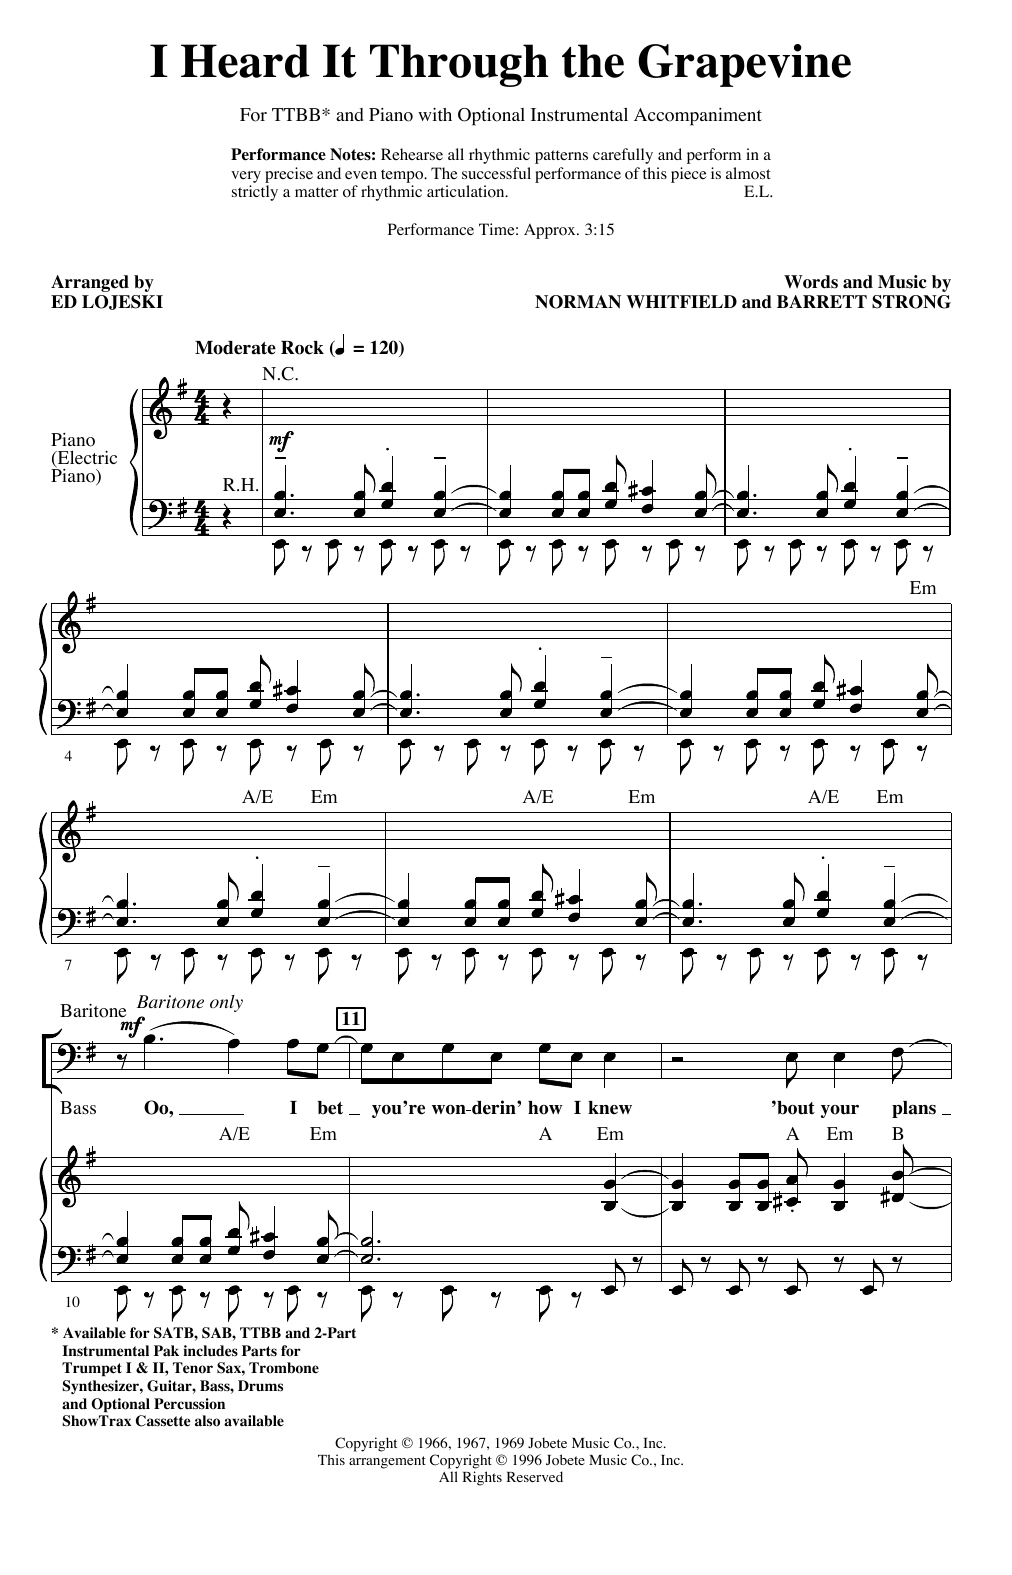 I Heard It Through The Grapevine (arr. Ed Lojeski) (TTBB Choir)